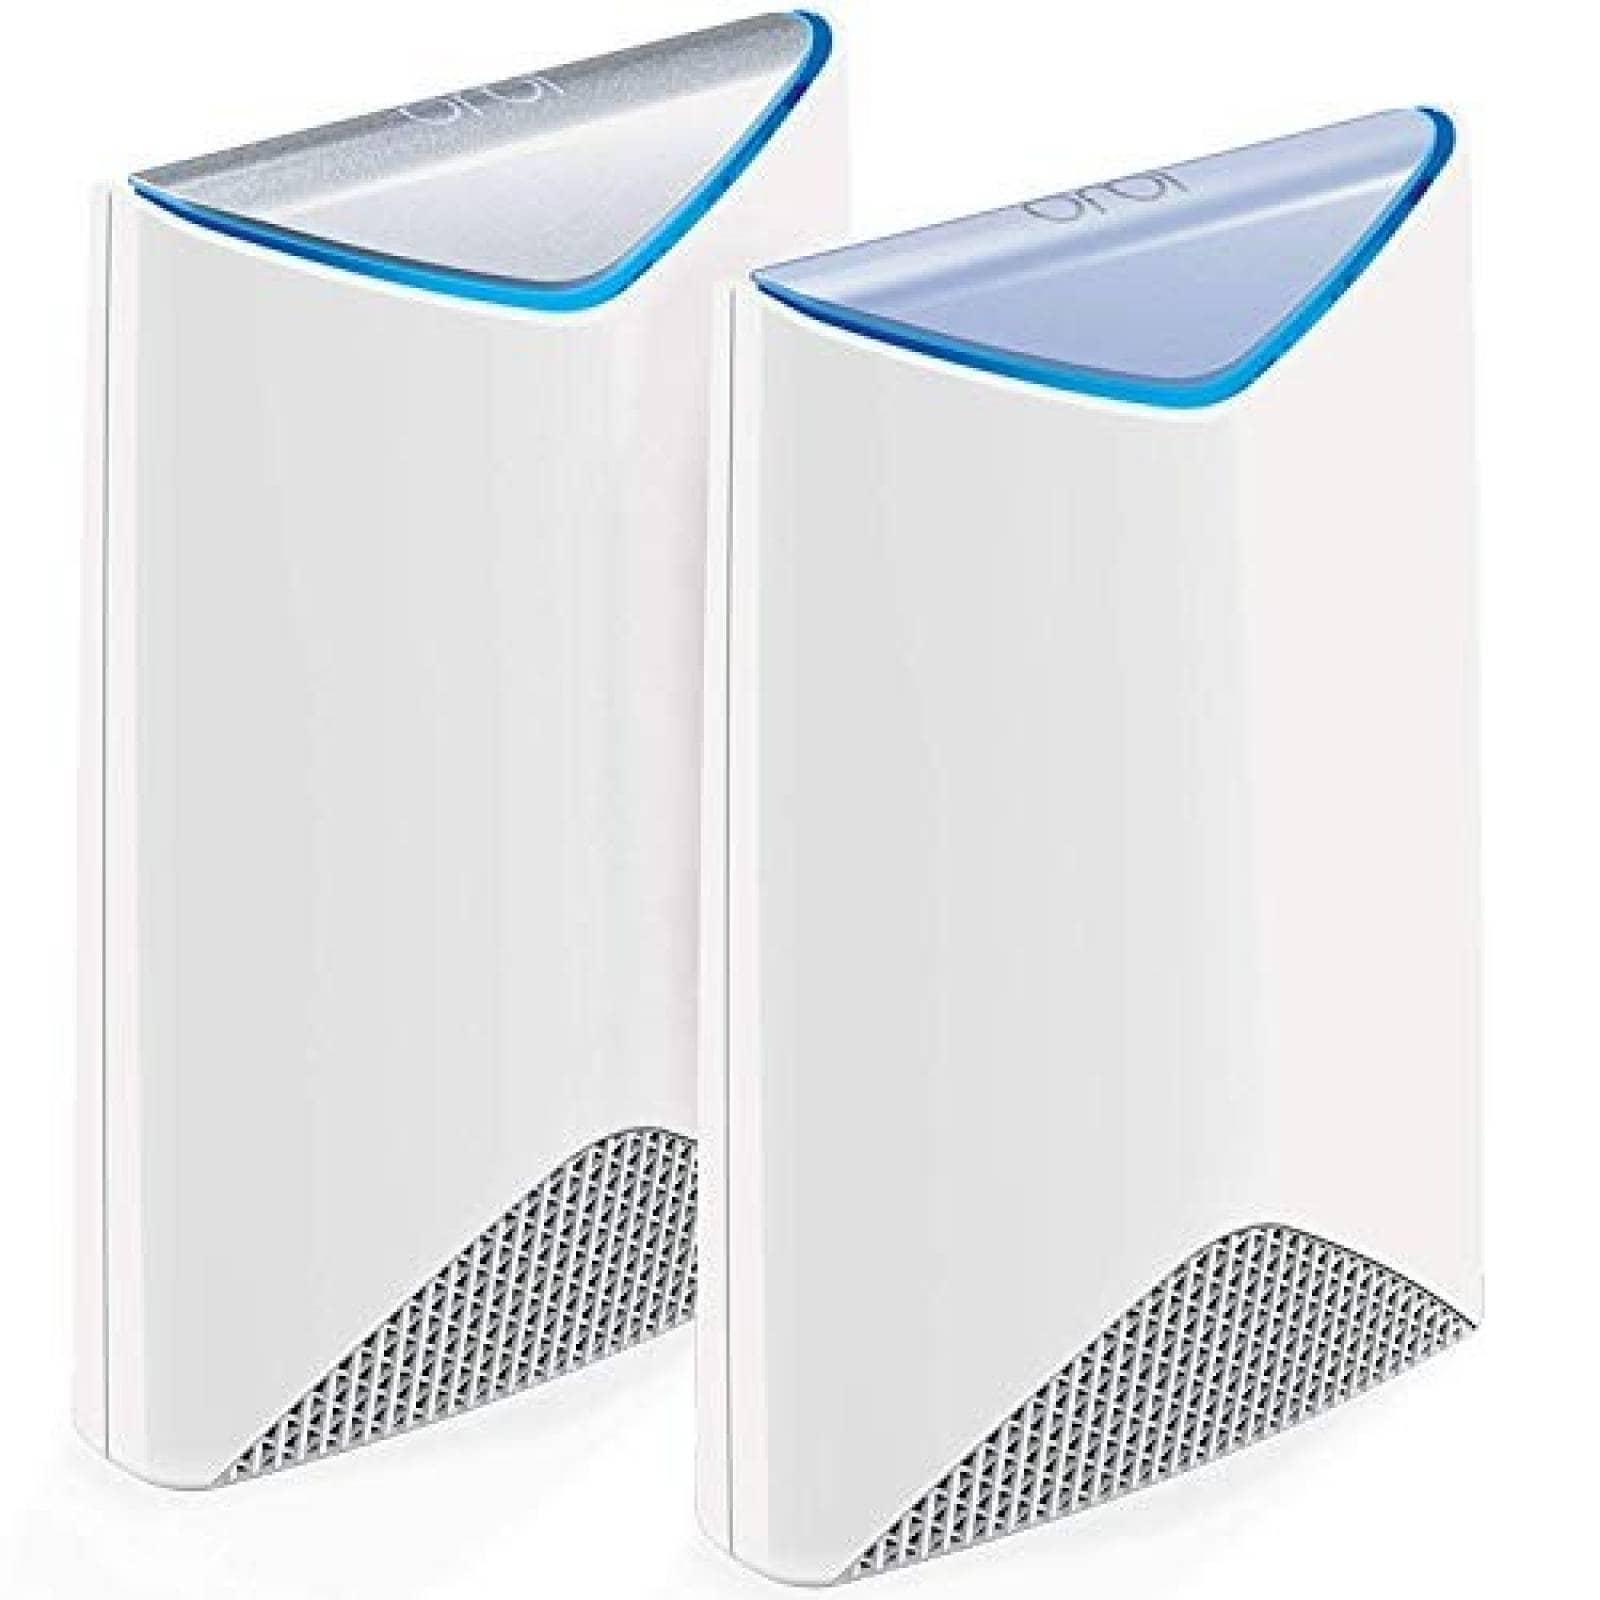 Kit 2 piezas Sistema Wi-Fi NETGEAR SRK60 Orbi AC3000